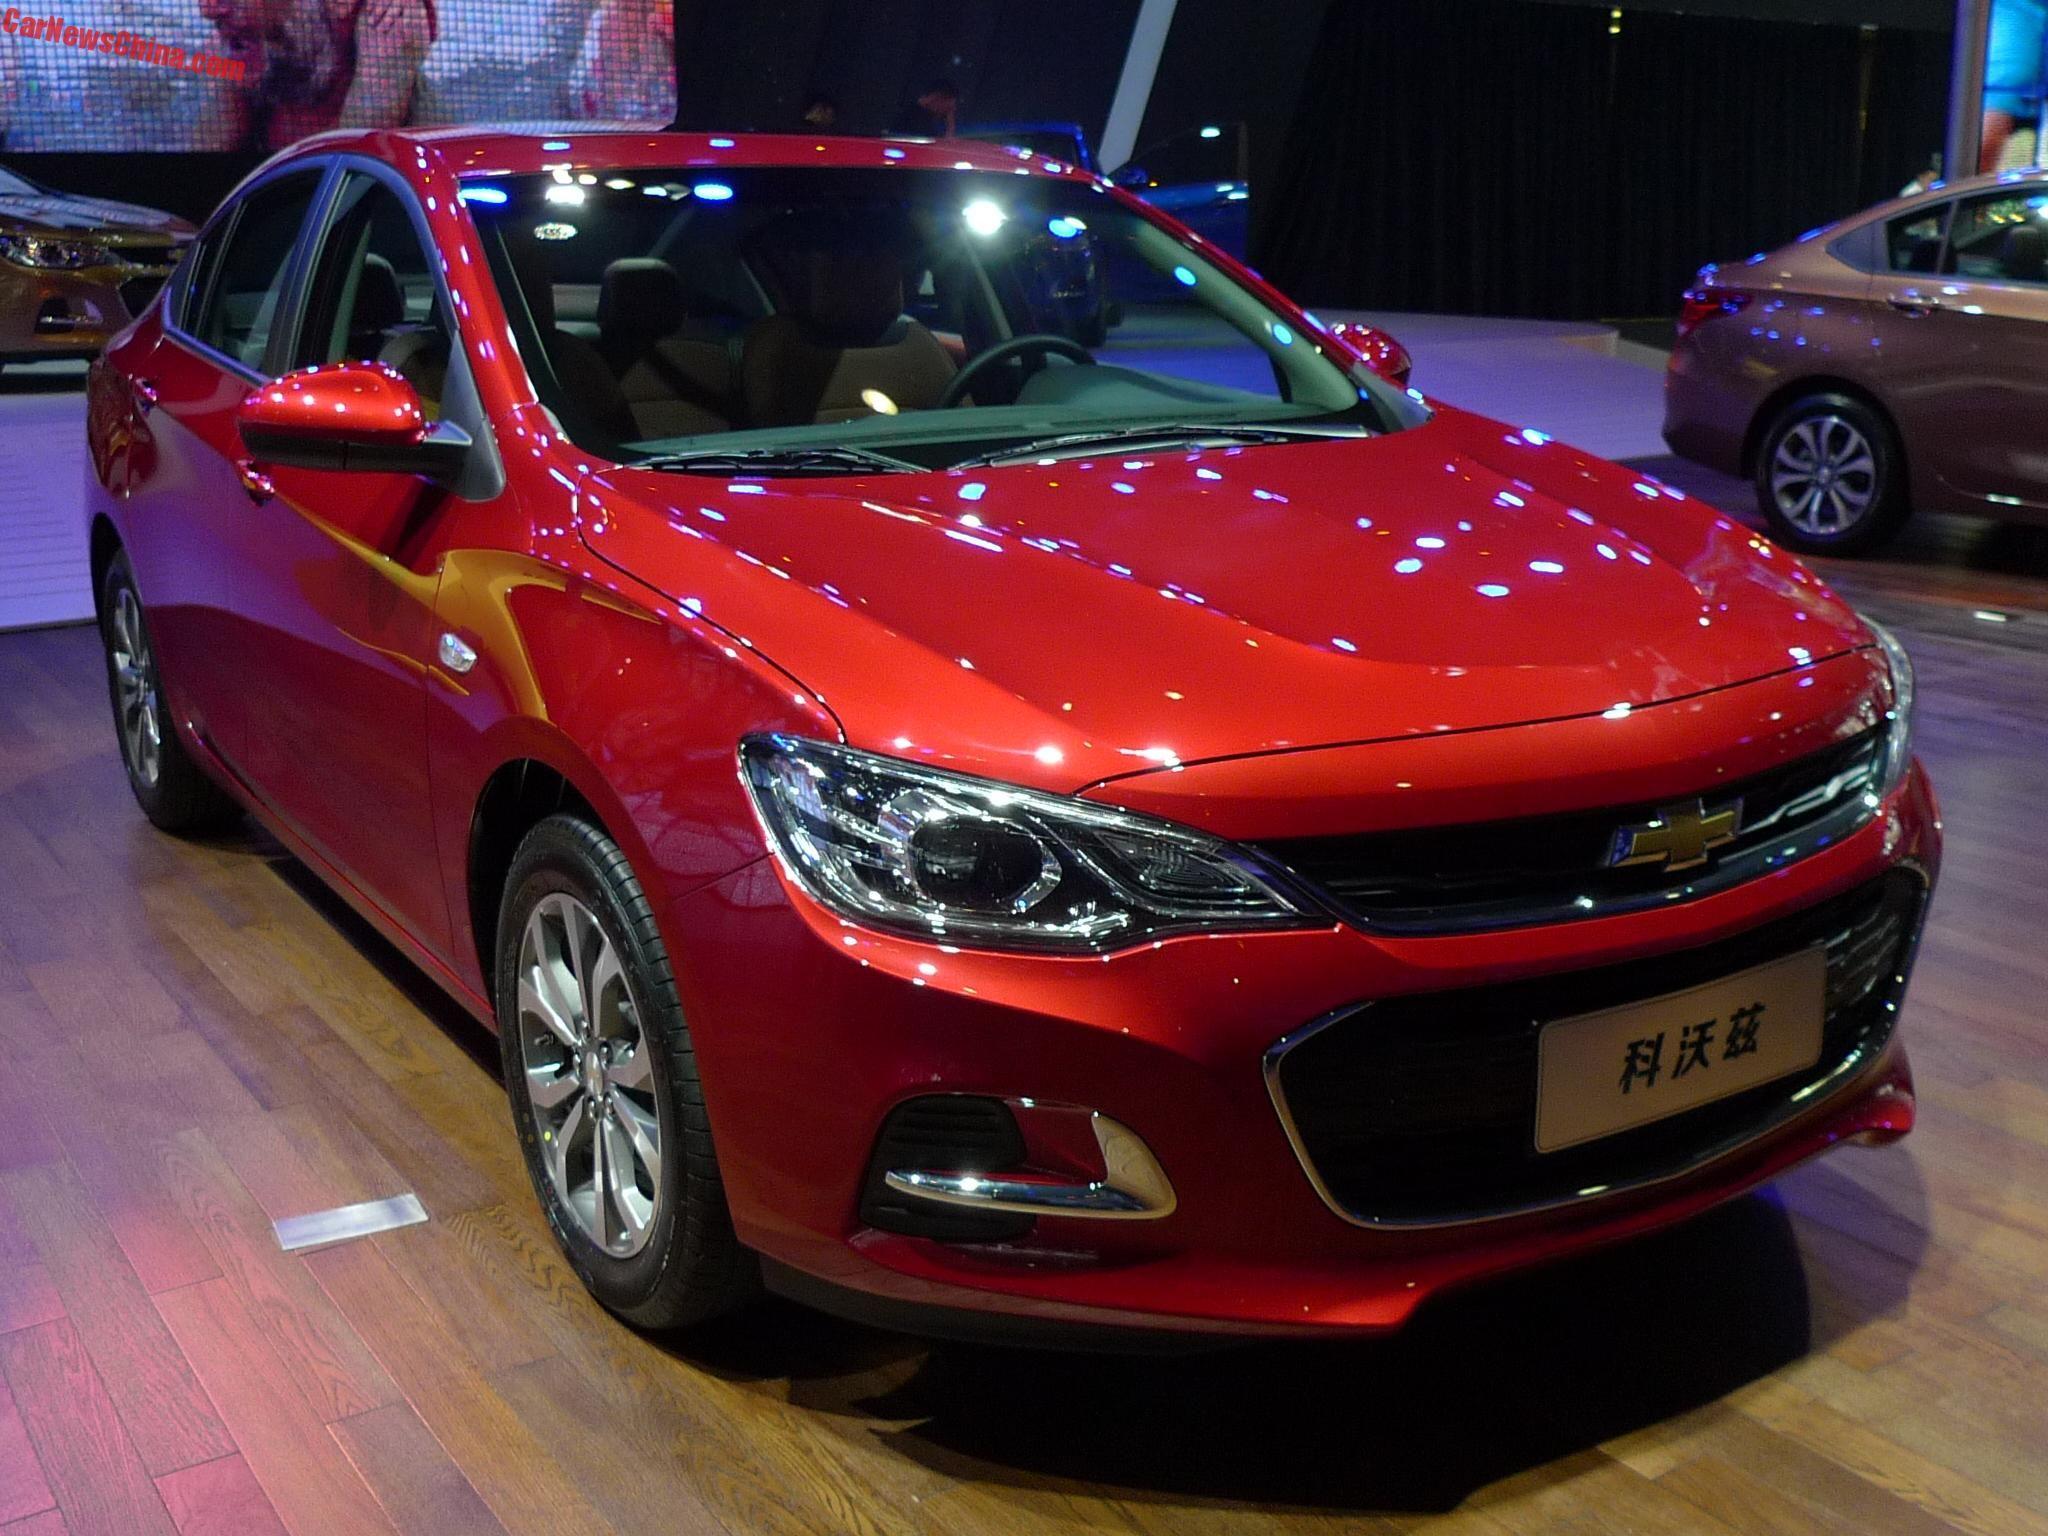 2016 Chevrolet Cavalier